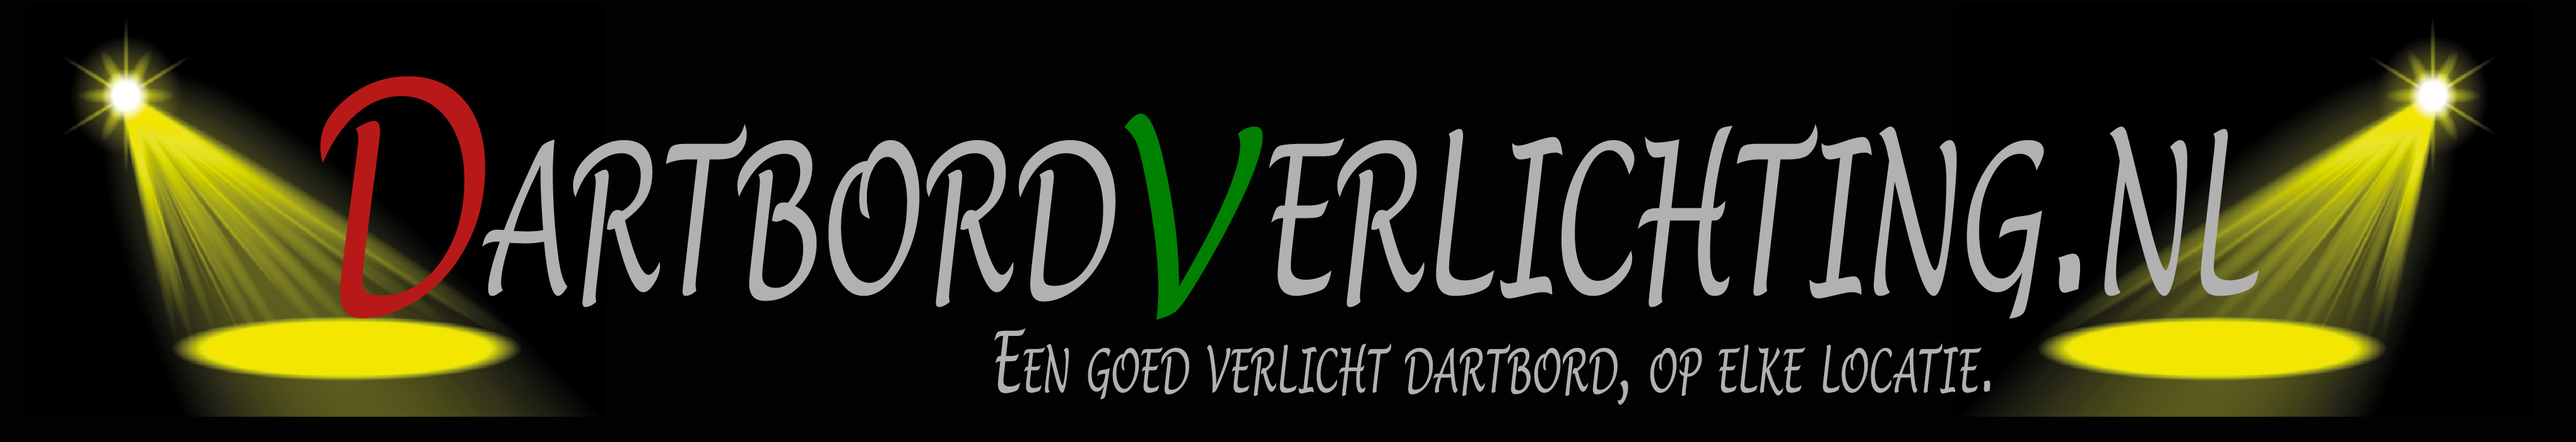 Dartbordverlichting.nl logo